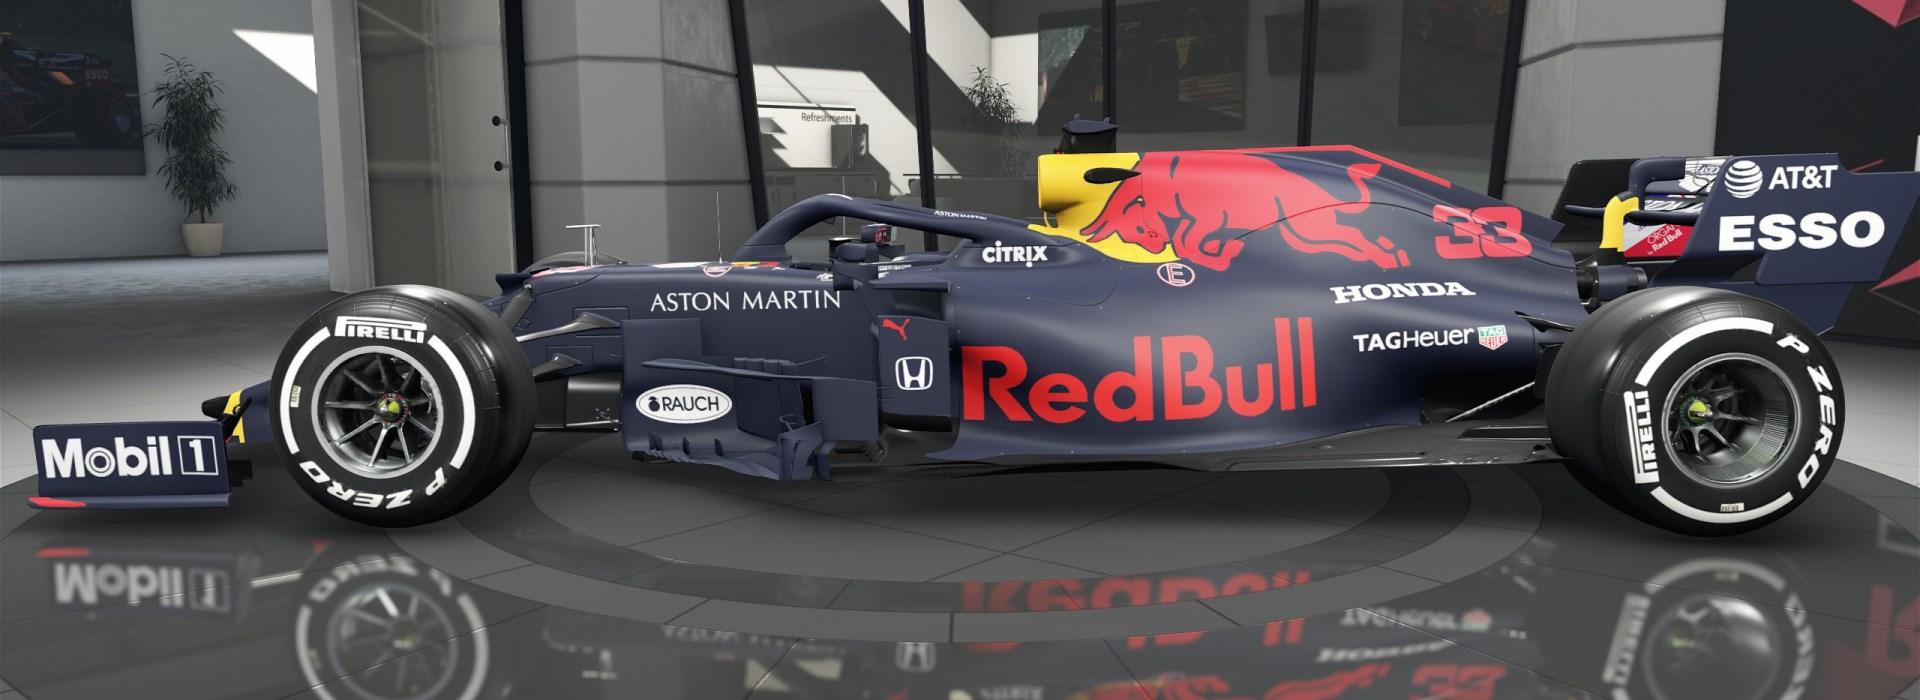 Red Bull Racing 2020 max verstappen